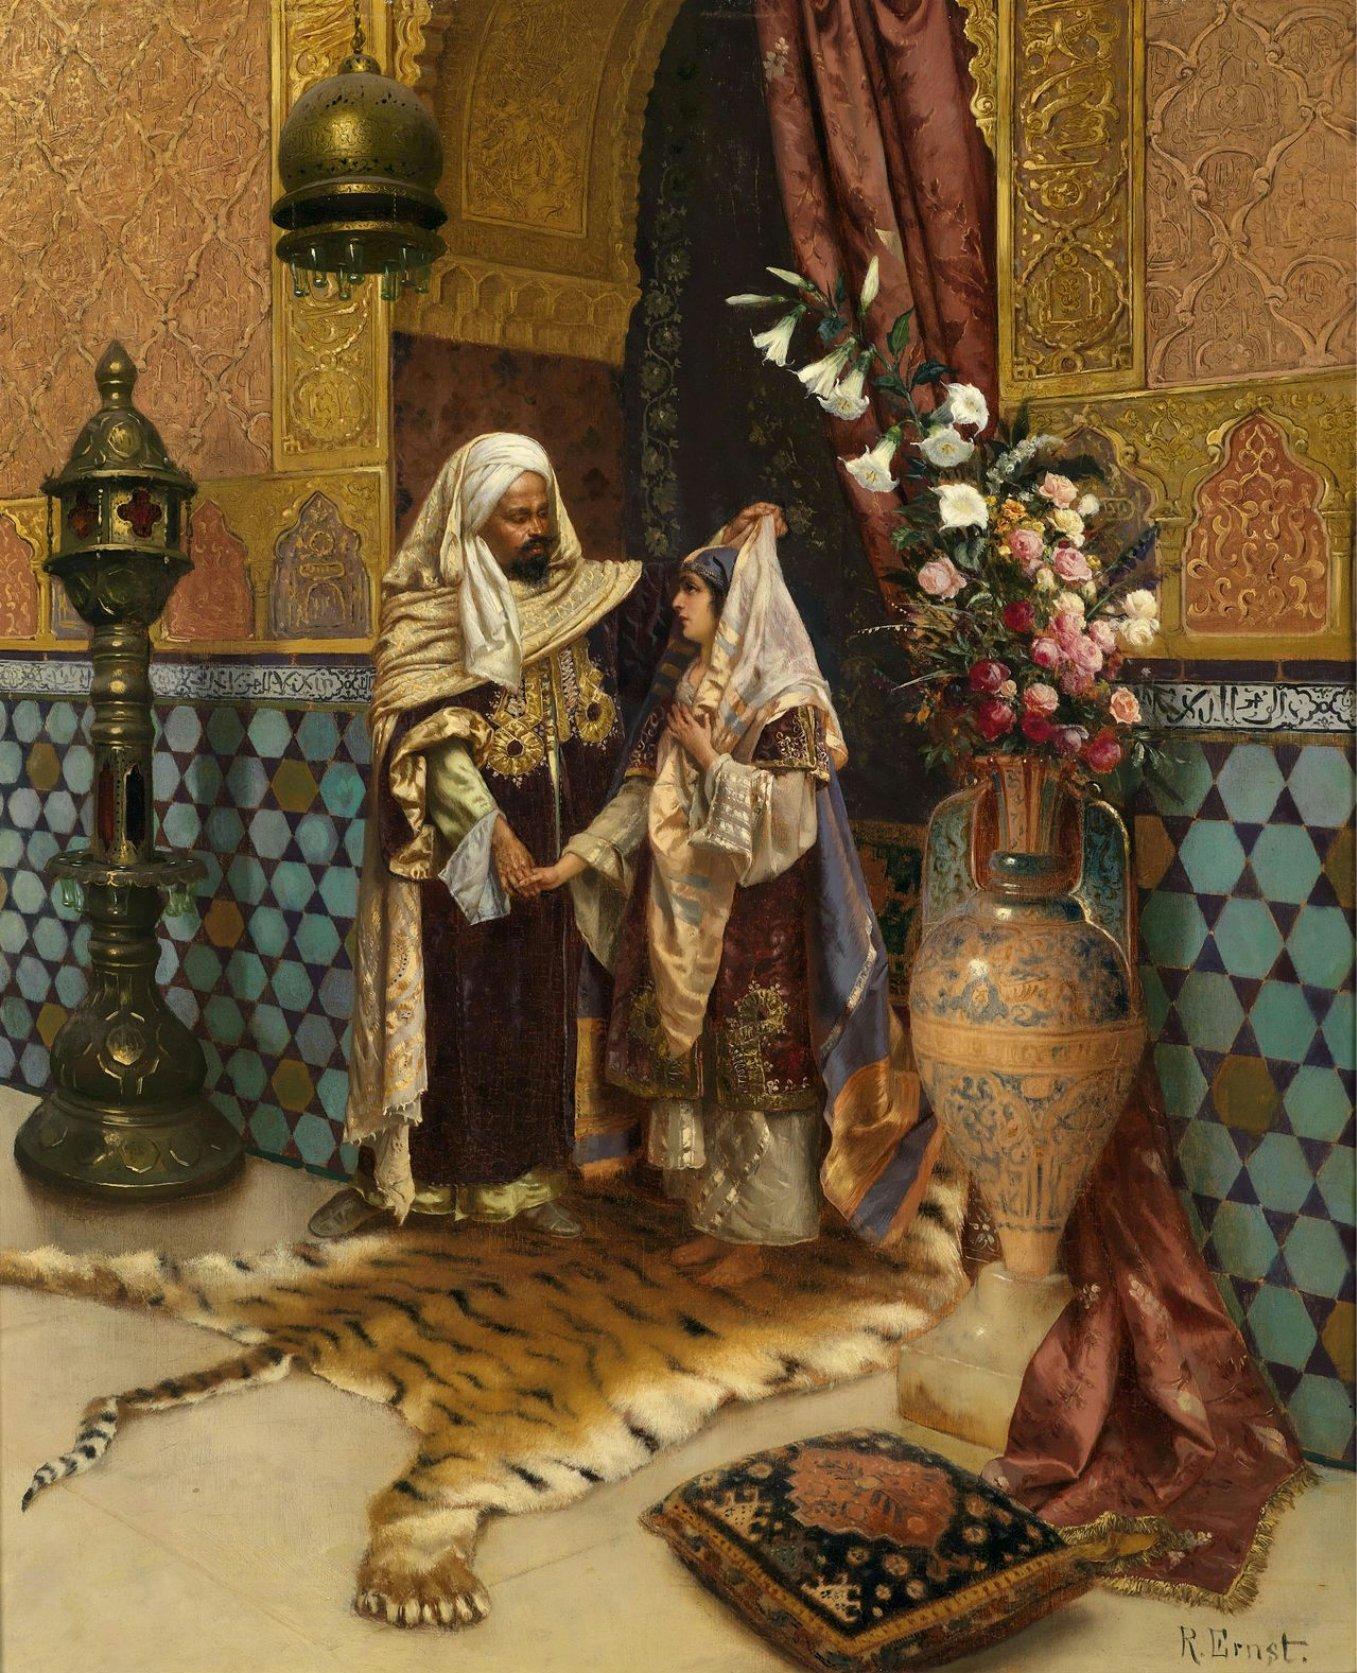 Ibn Hazm, ce poète andalou